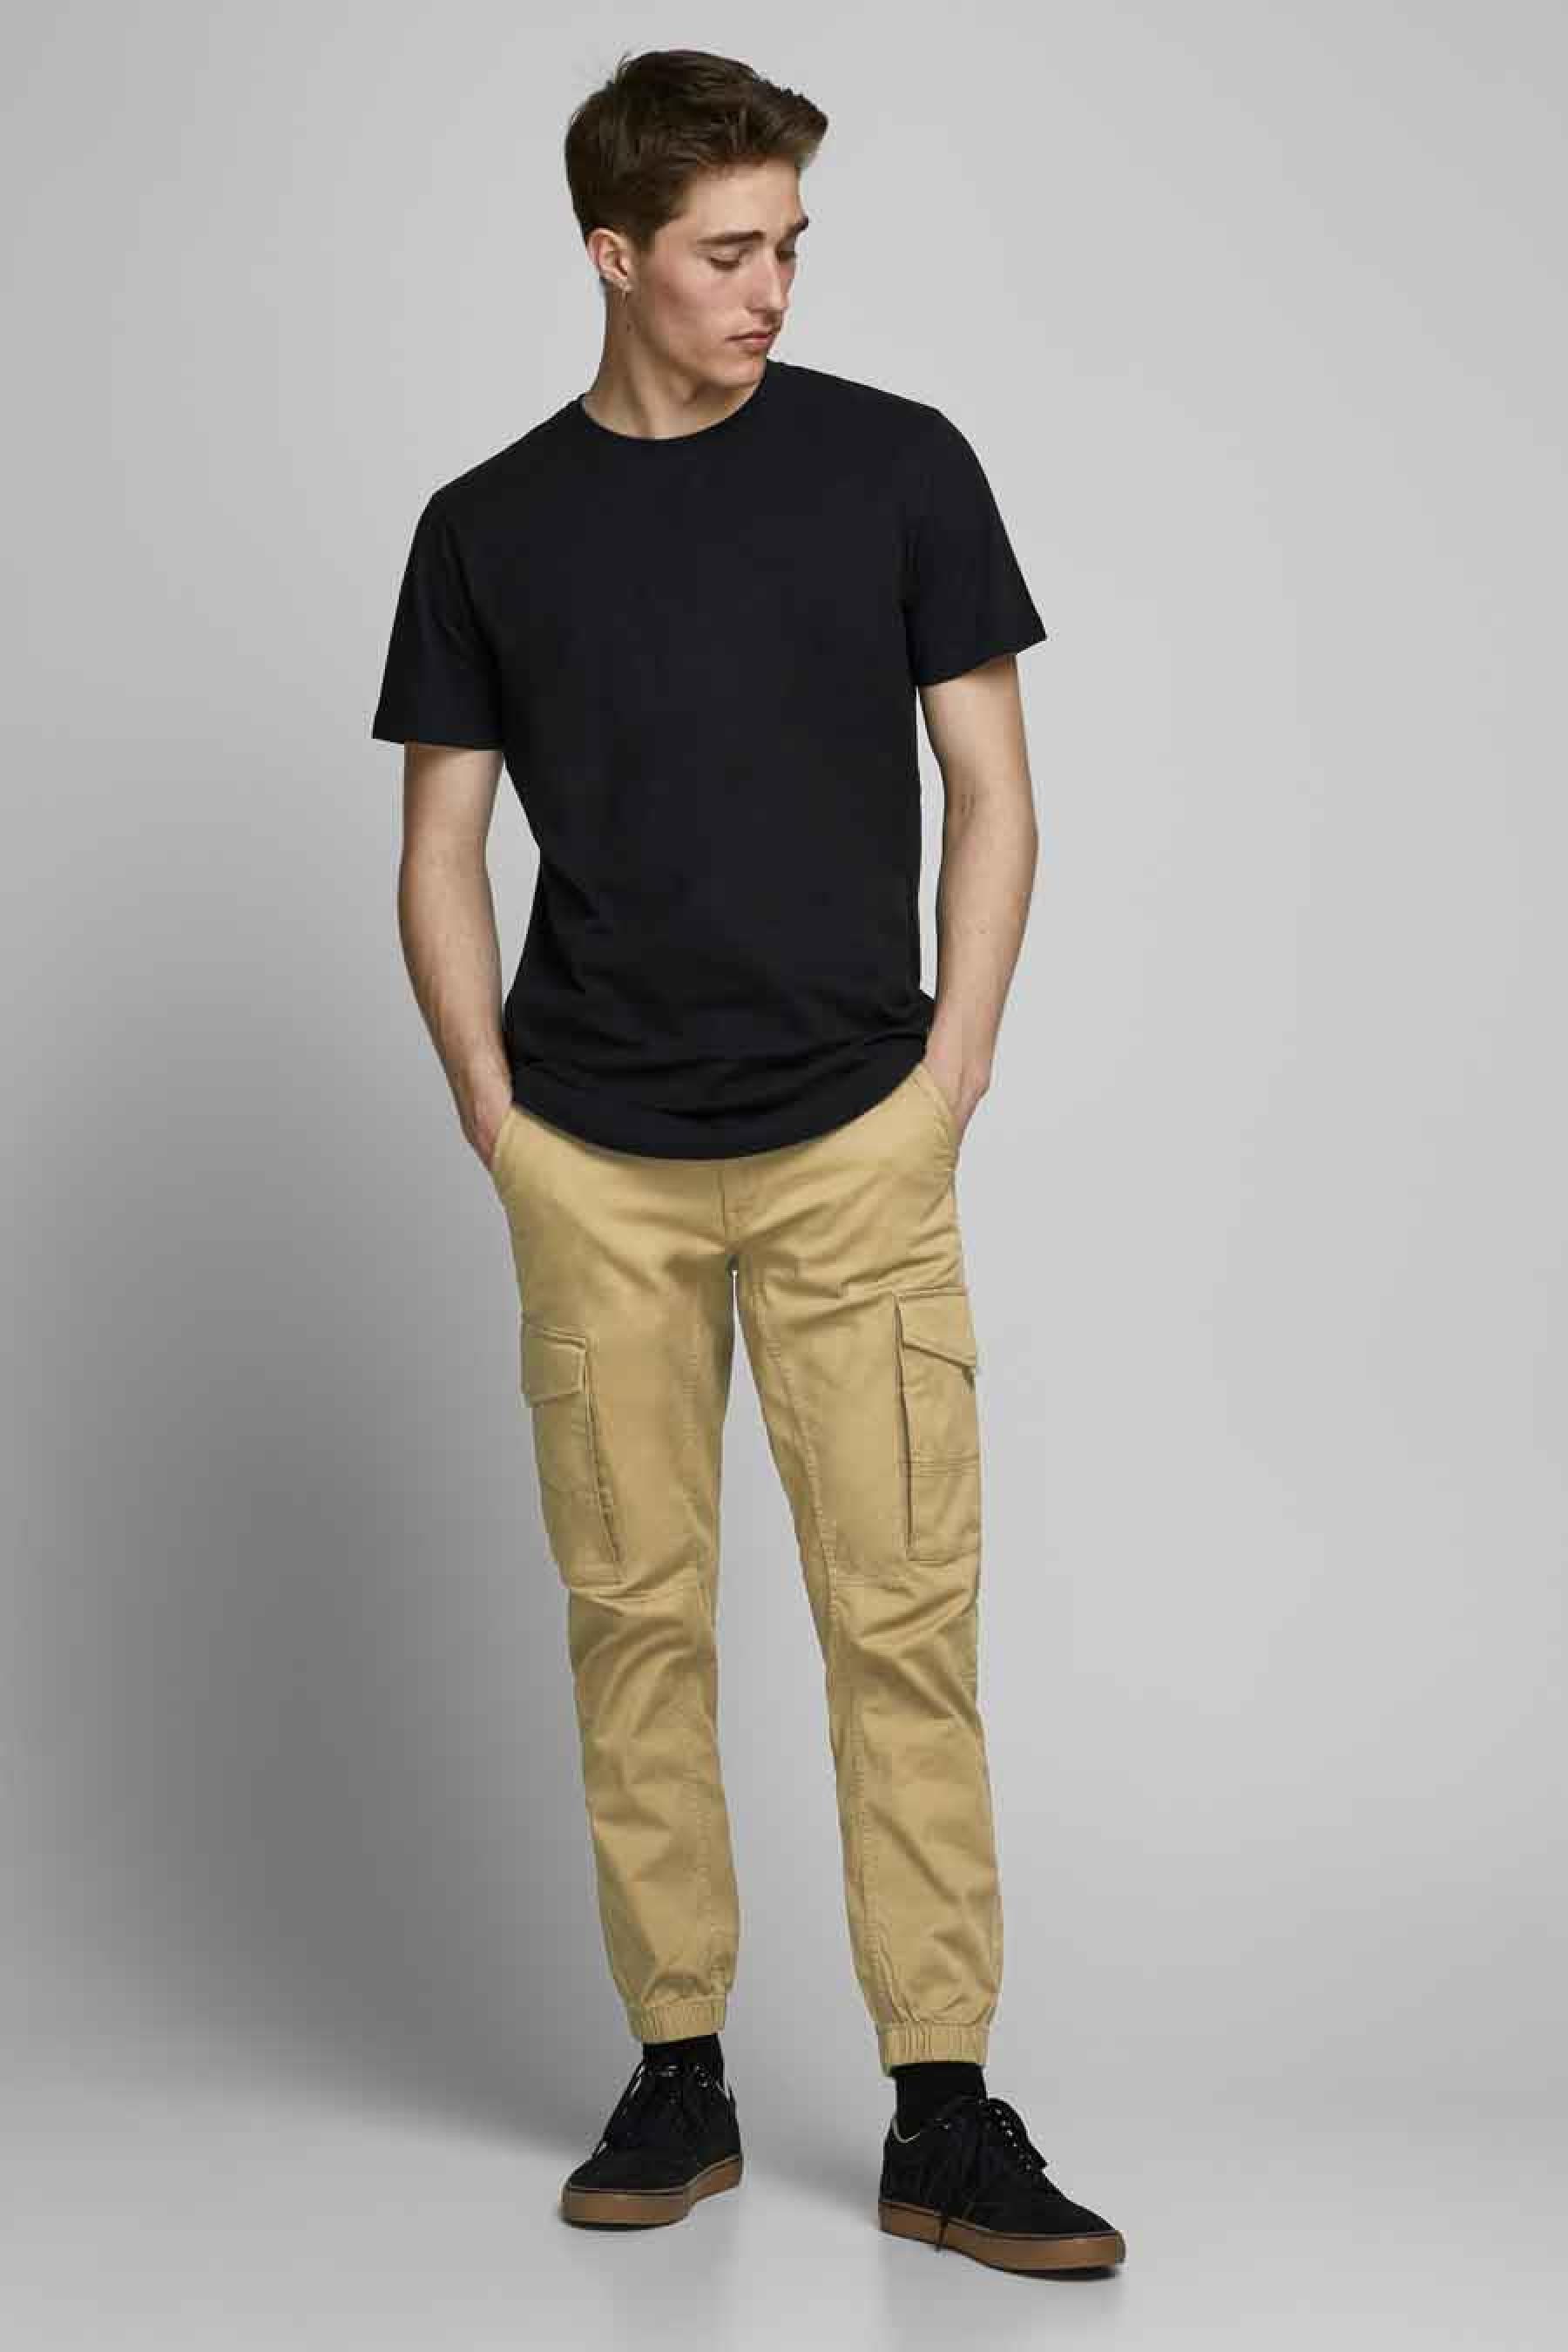 Jack & Jones Jeans Intelligenc Chino, Rood, Heren, Maat: 29x34/30x32/30x34/31x32